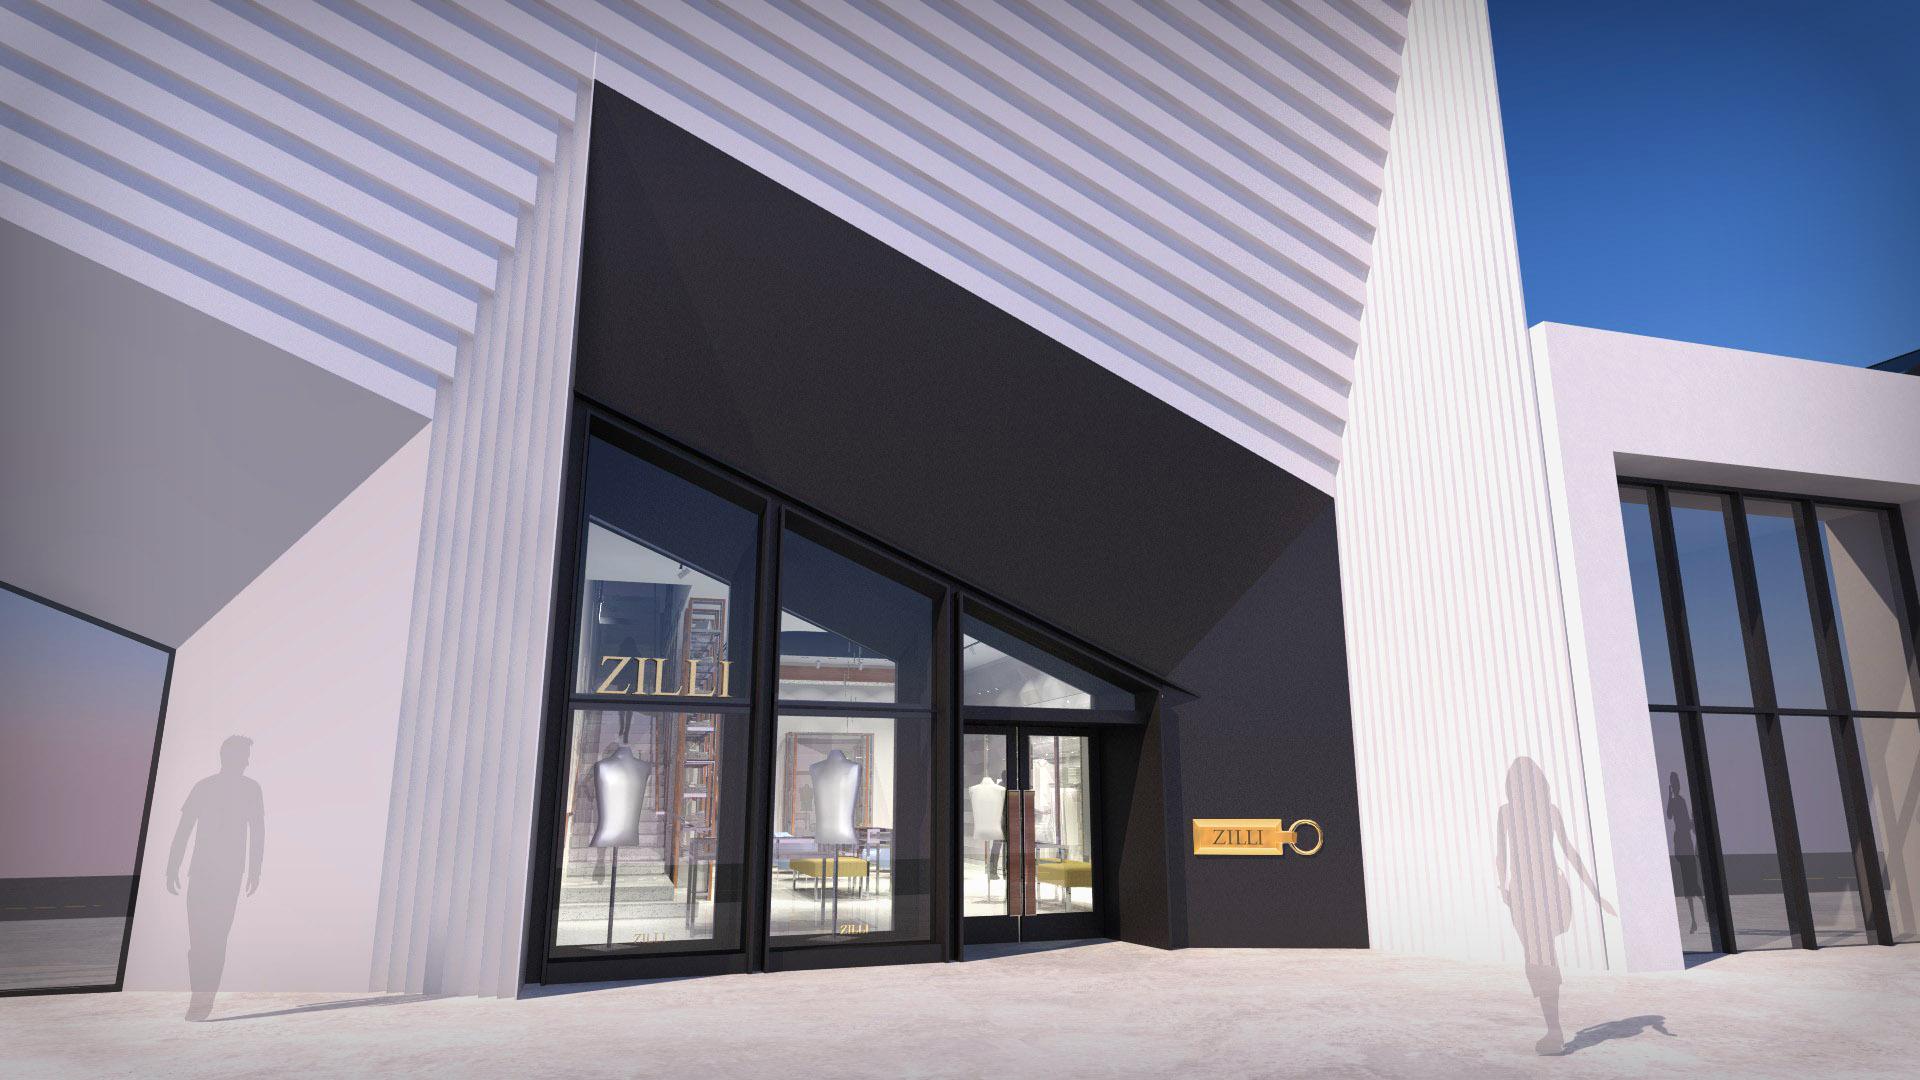 ZILLI miami_Level 1_exterior_01